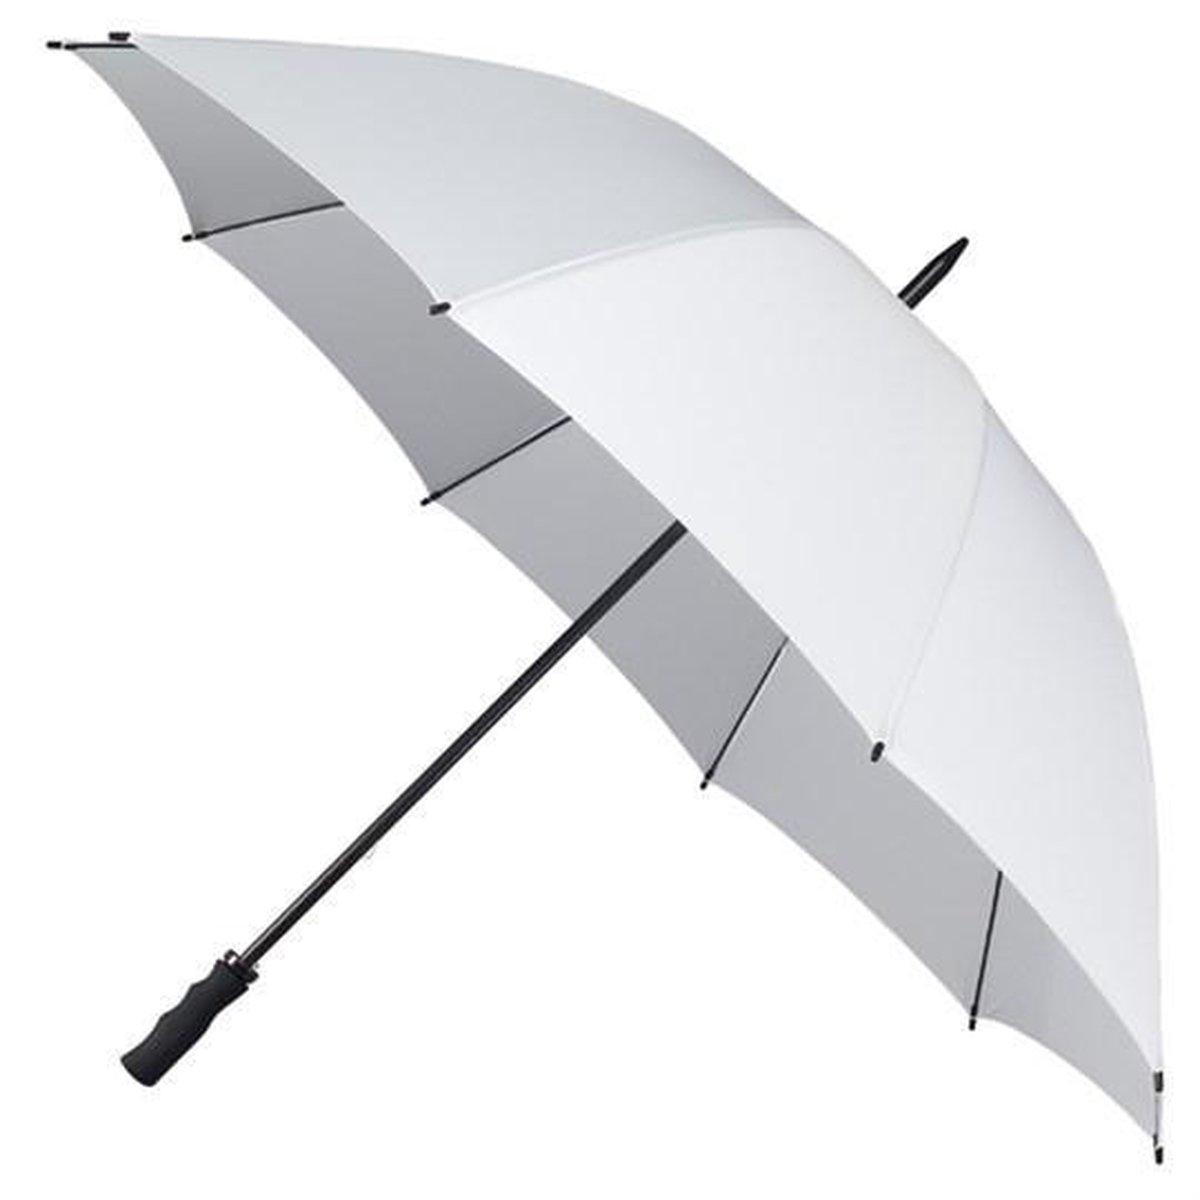 Falcone Extra Strong Paraplu - Ø 130 cm - Wit